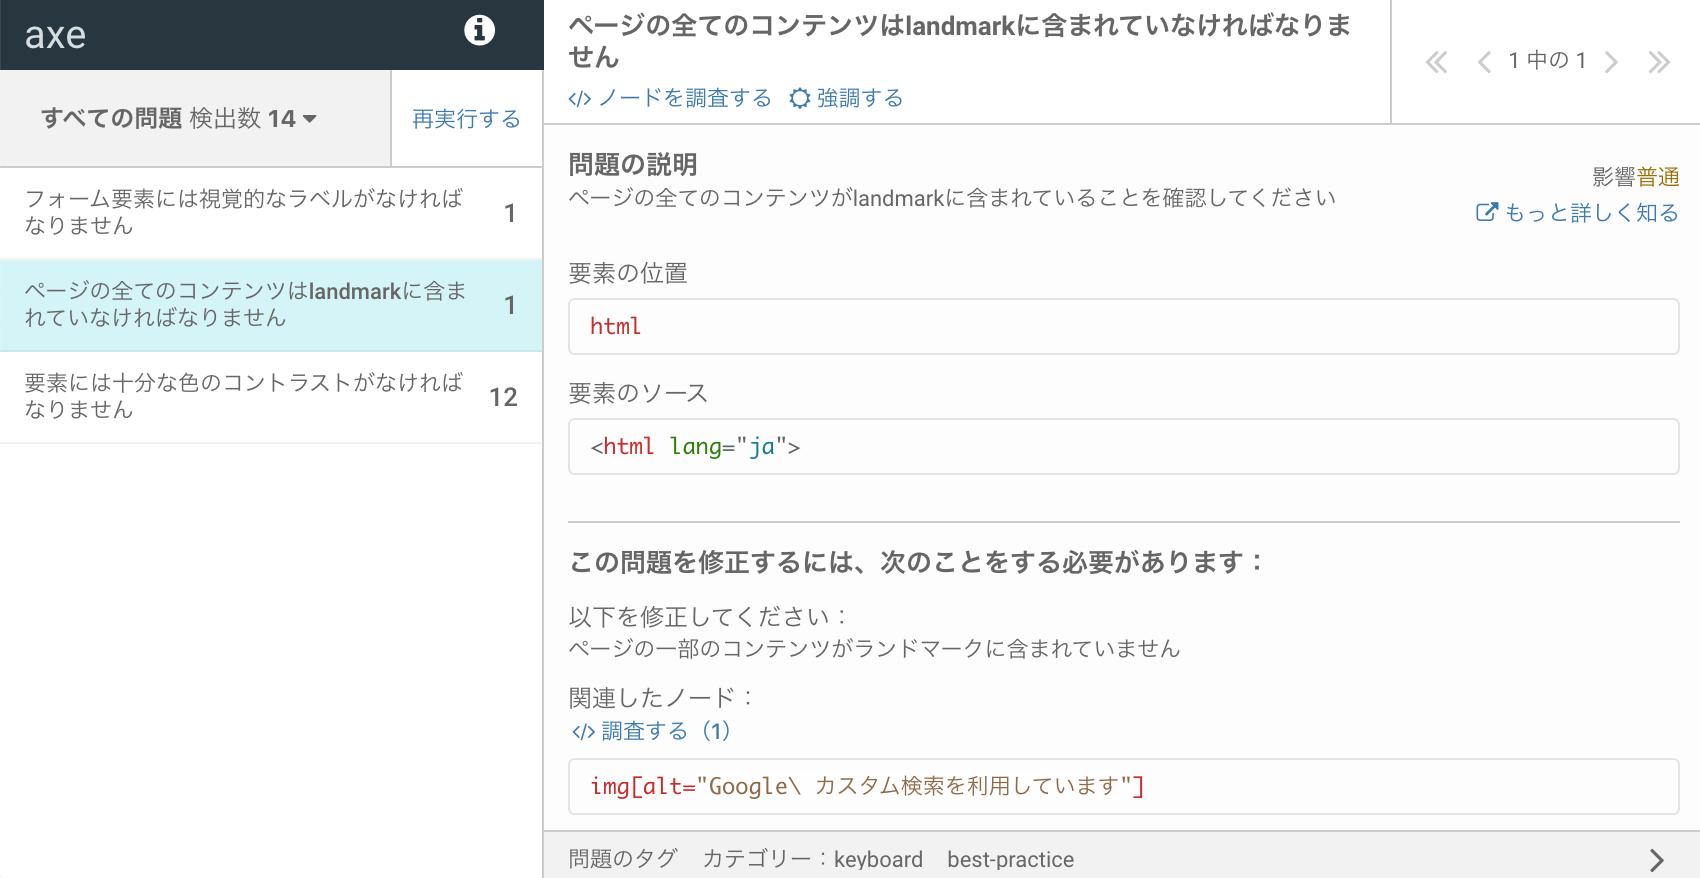 Firefox版のaxeアドオンを日本語の言語設定で利用している状態の画面キャプチャ